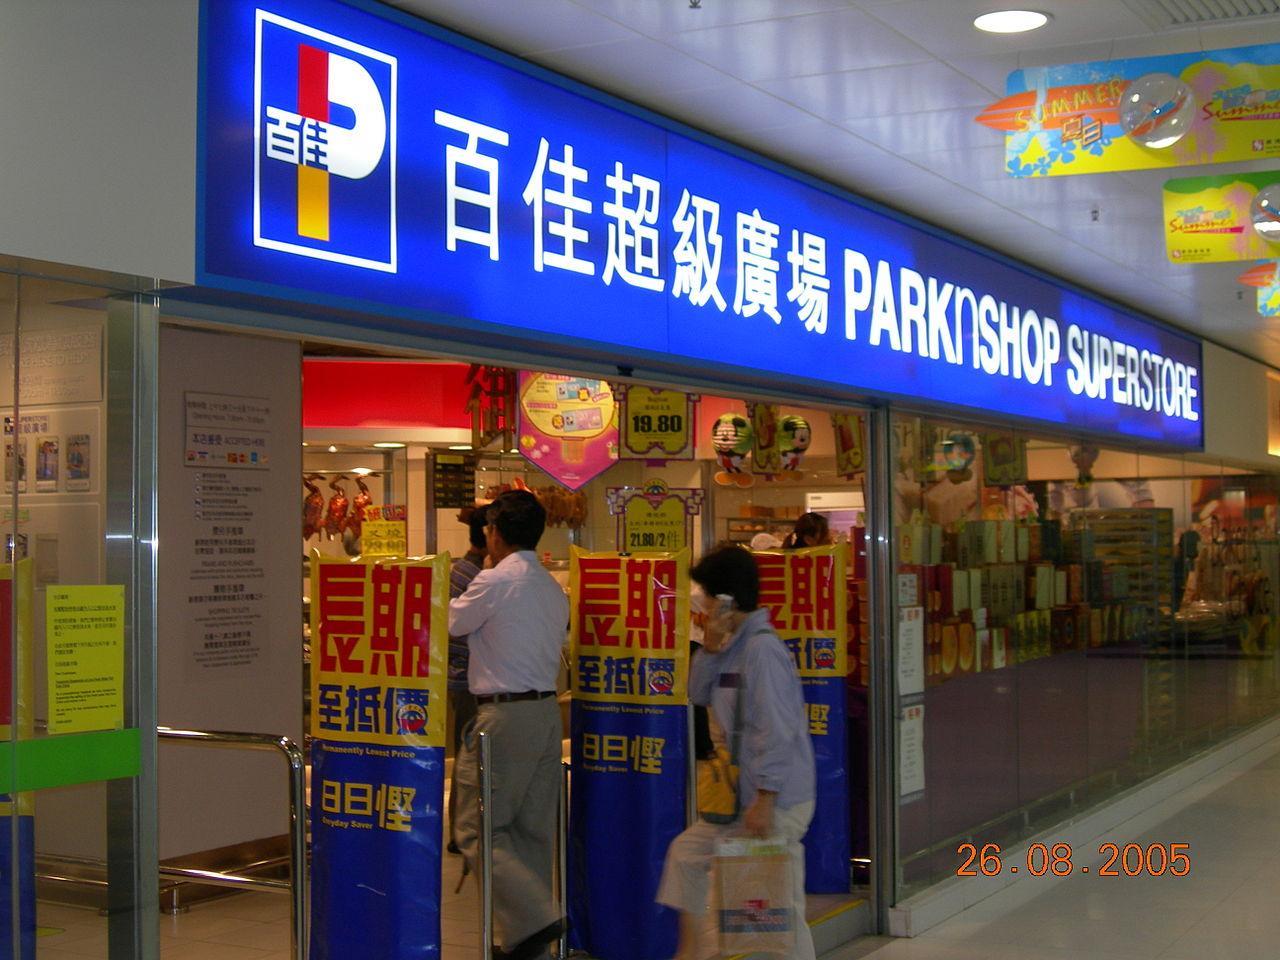 1280px-ParknShop_in_Tai_Po_Mega_Mall.jpg